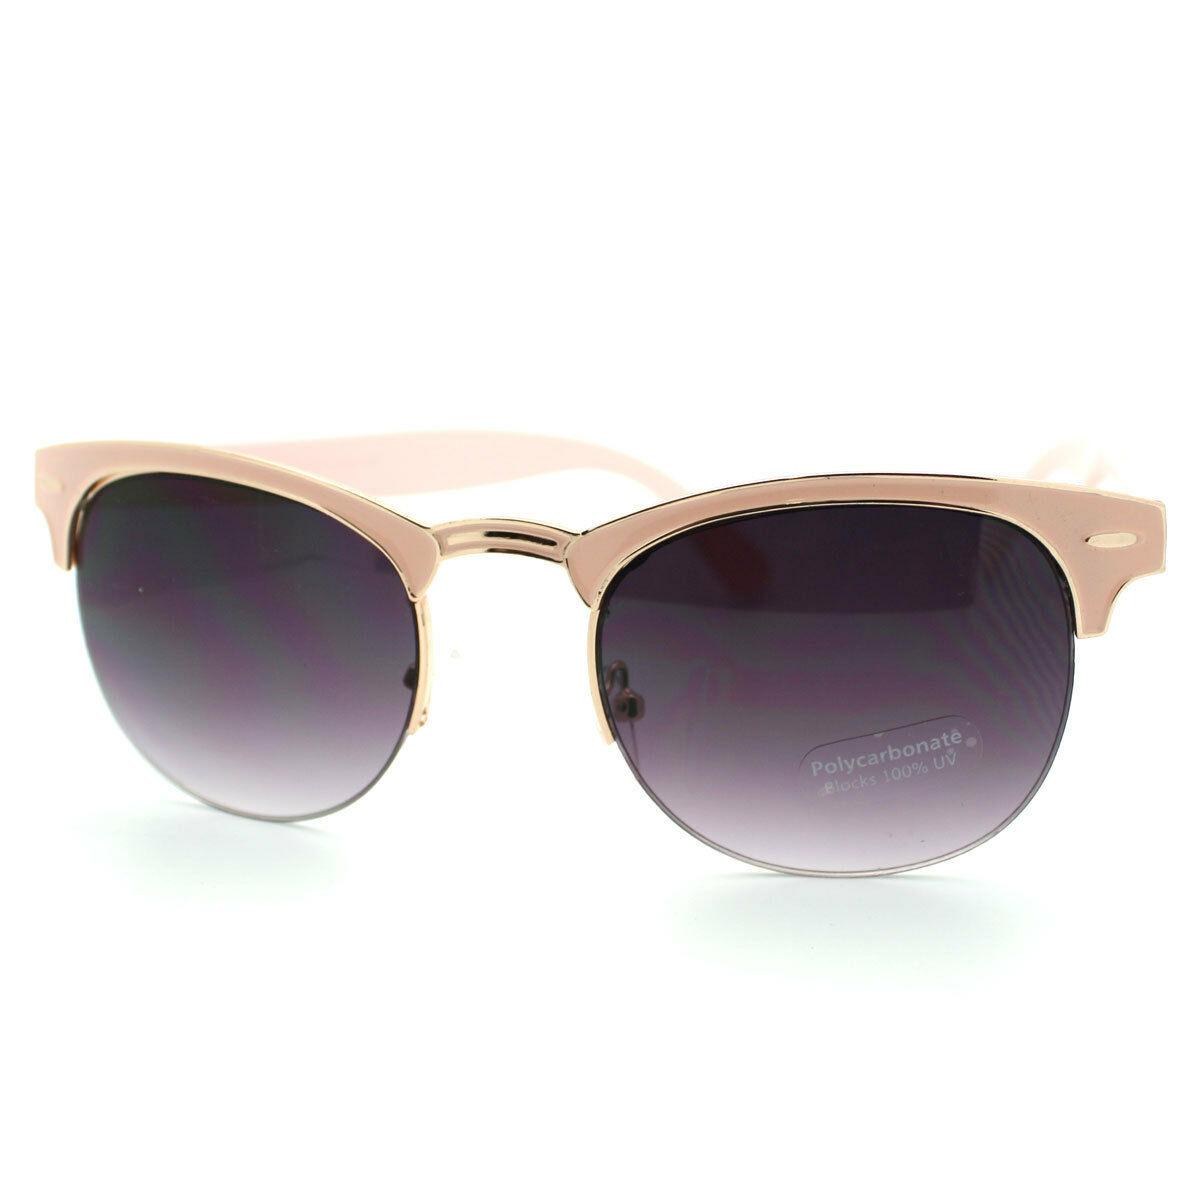 Womens Round Keyhole Sunglasses Cute Half Horn Rim Fashion Eyewear (5 Colors)